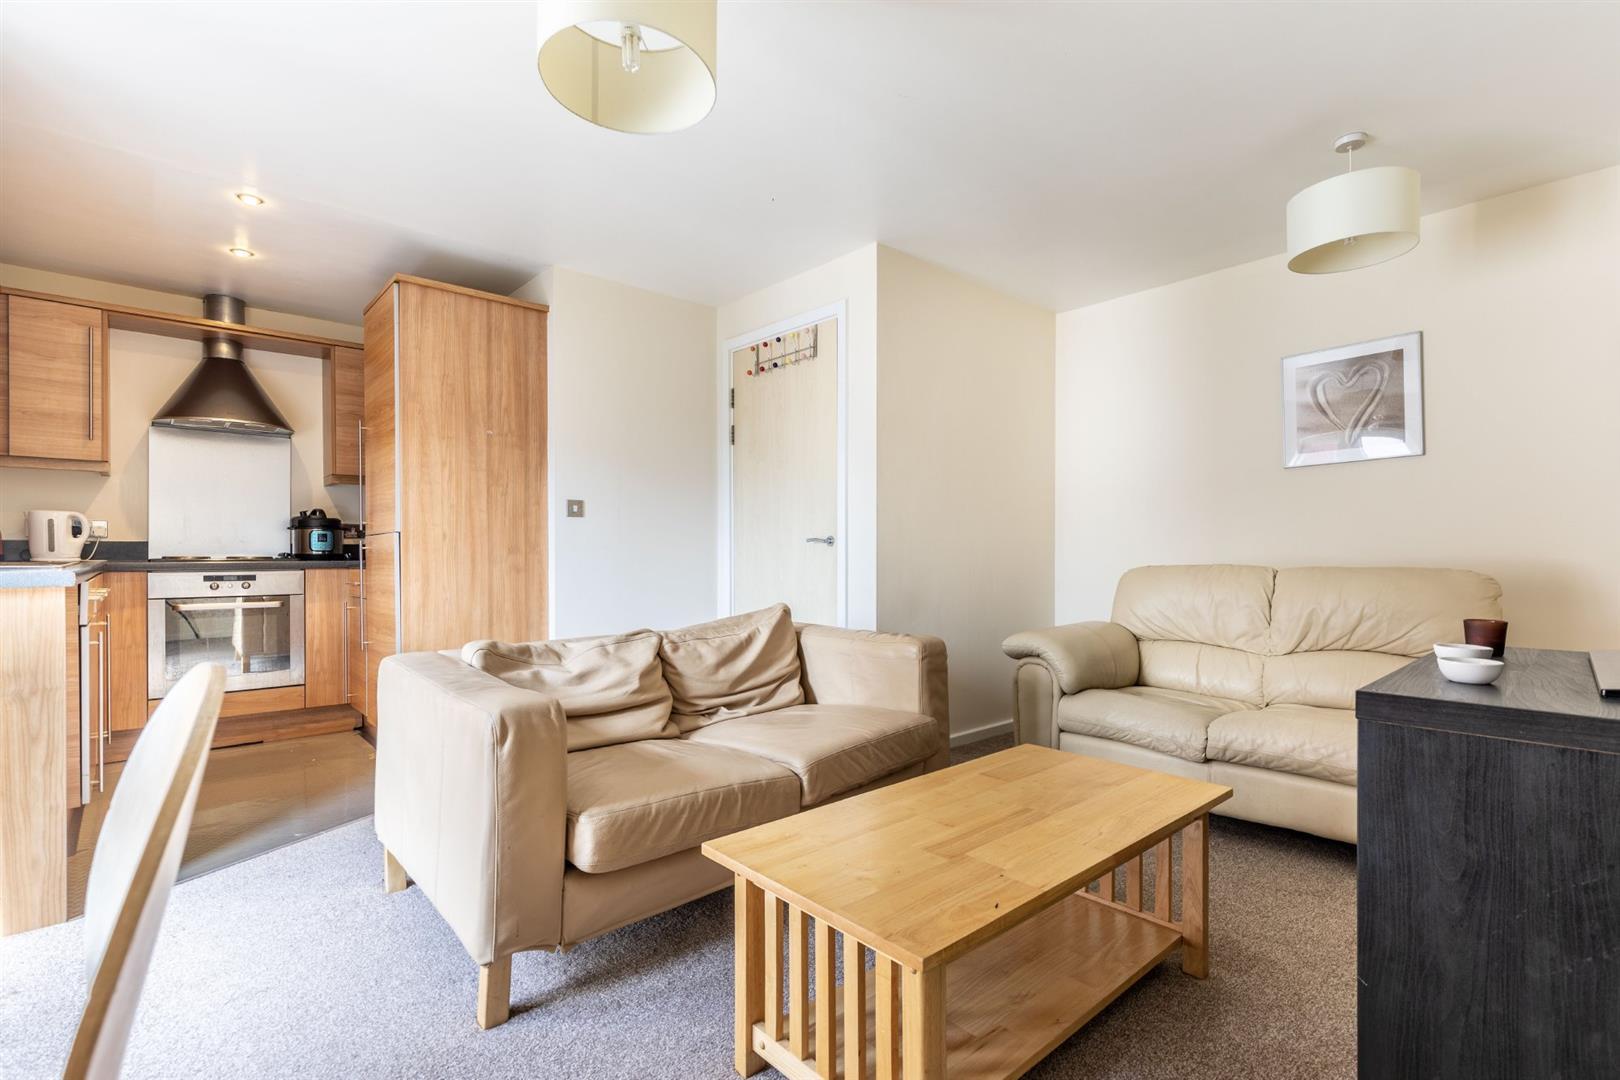 3 bed apartment to rent in Rialto Building, City Centre, NE1